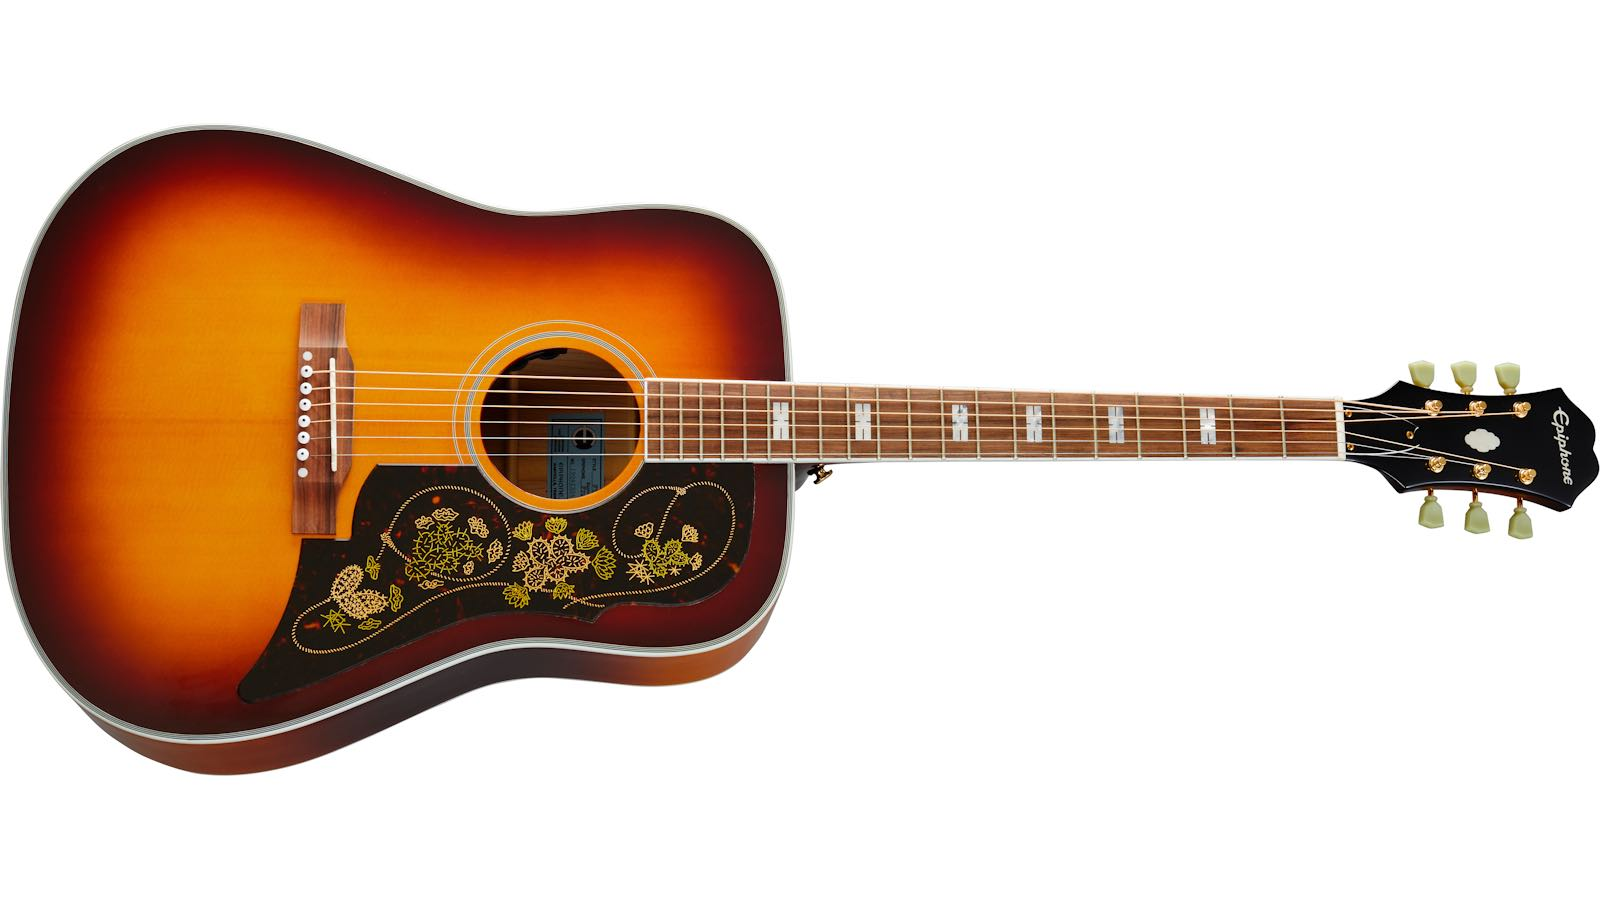 Epiphone Masterbilt Frontier chitarra acustica guitar acoustic strumenti musicali